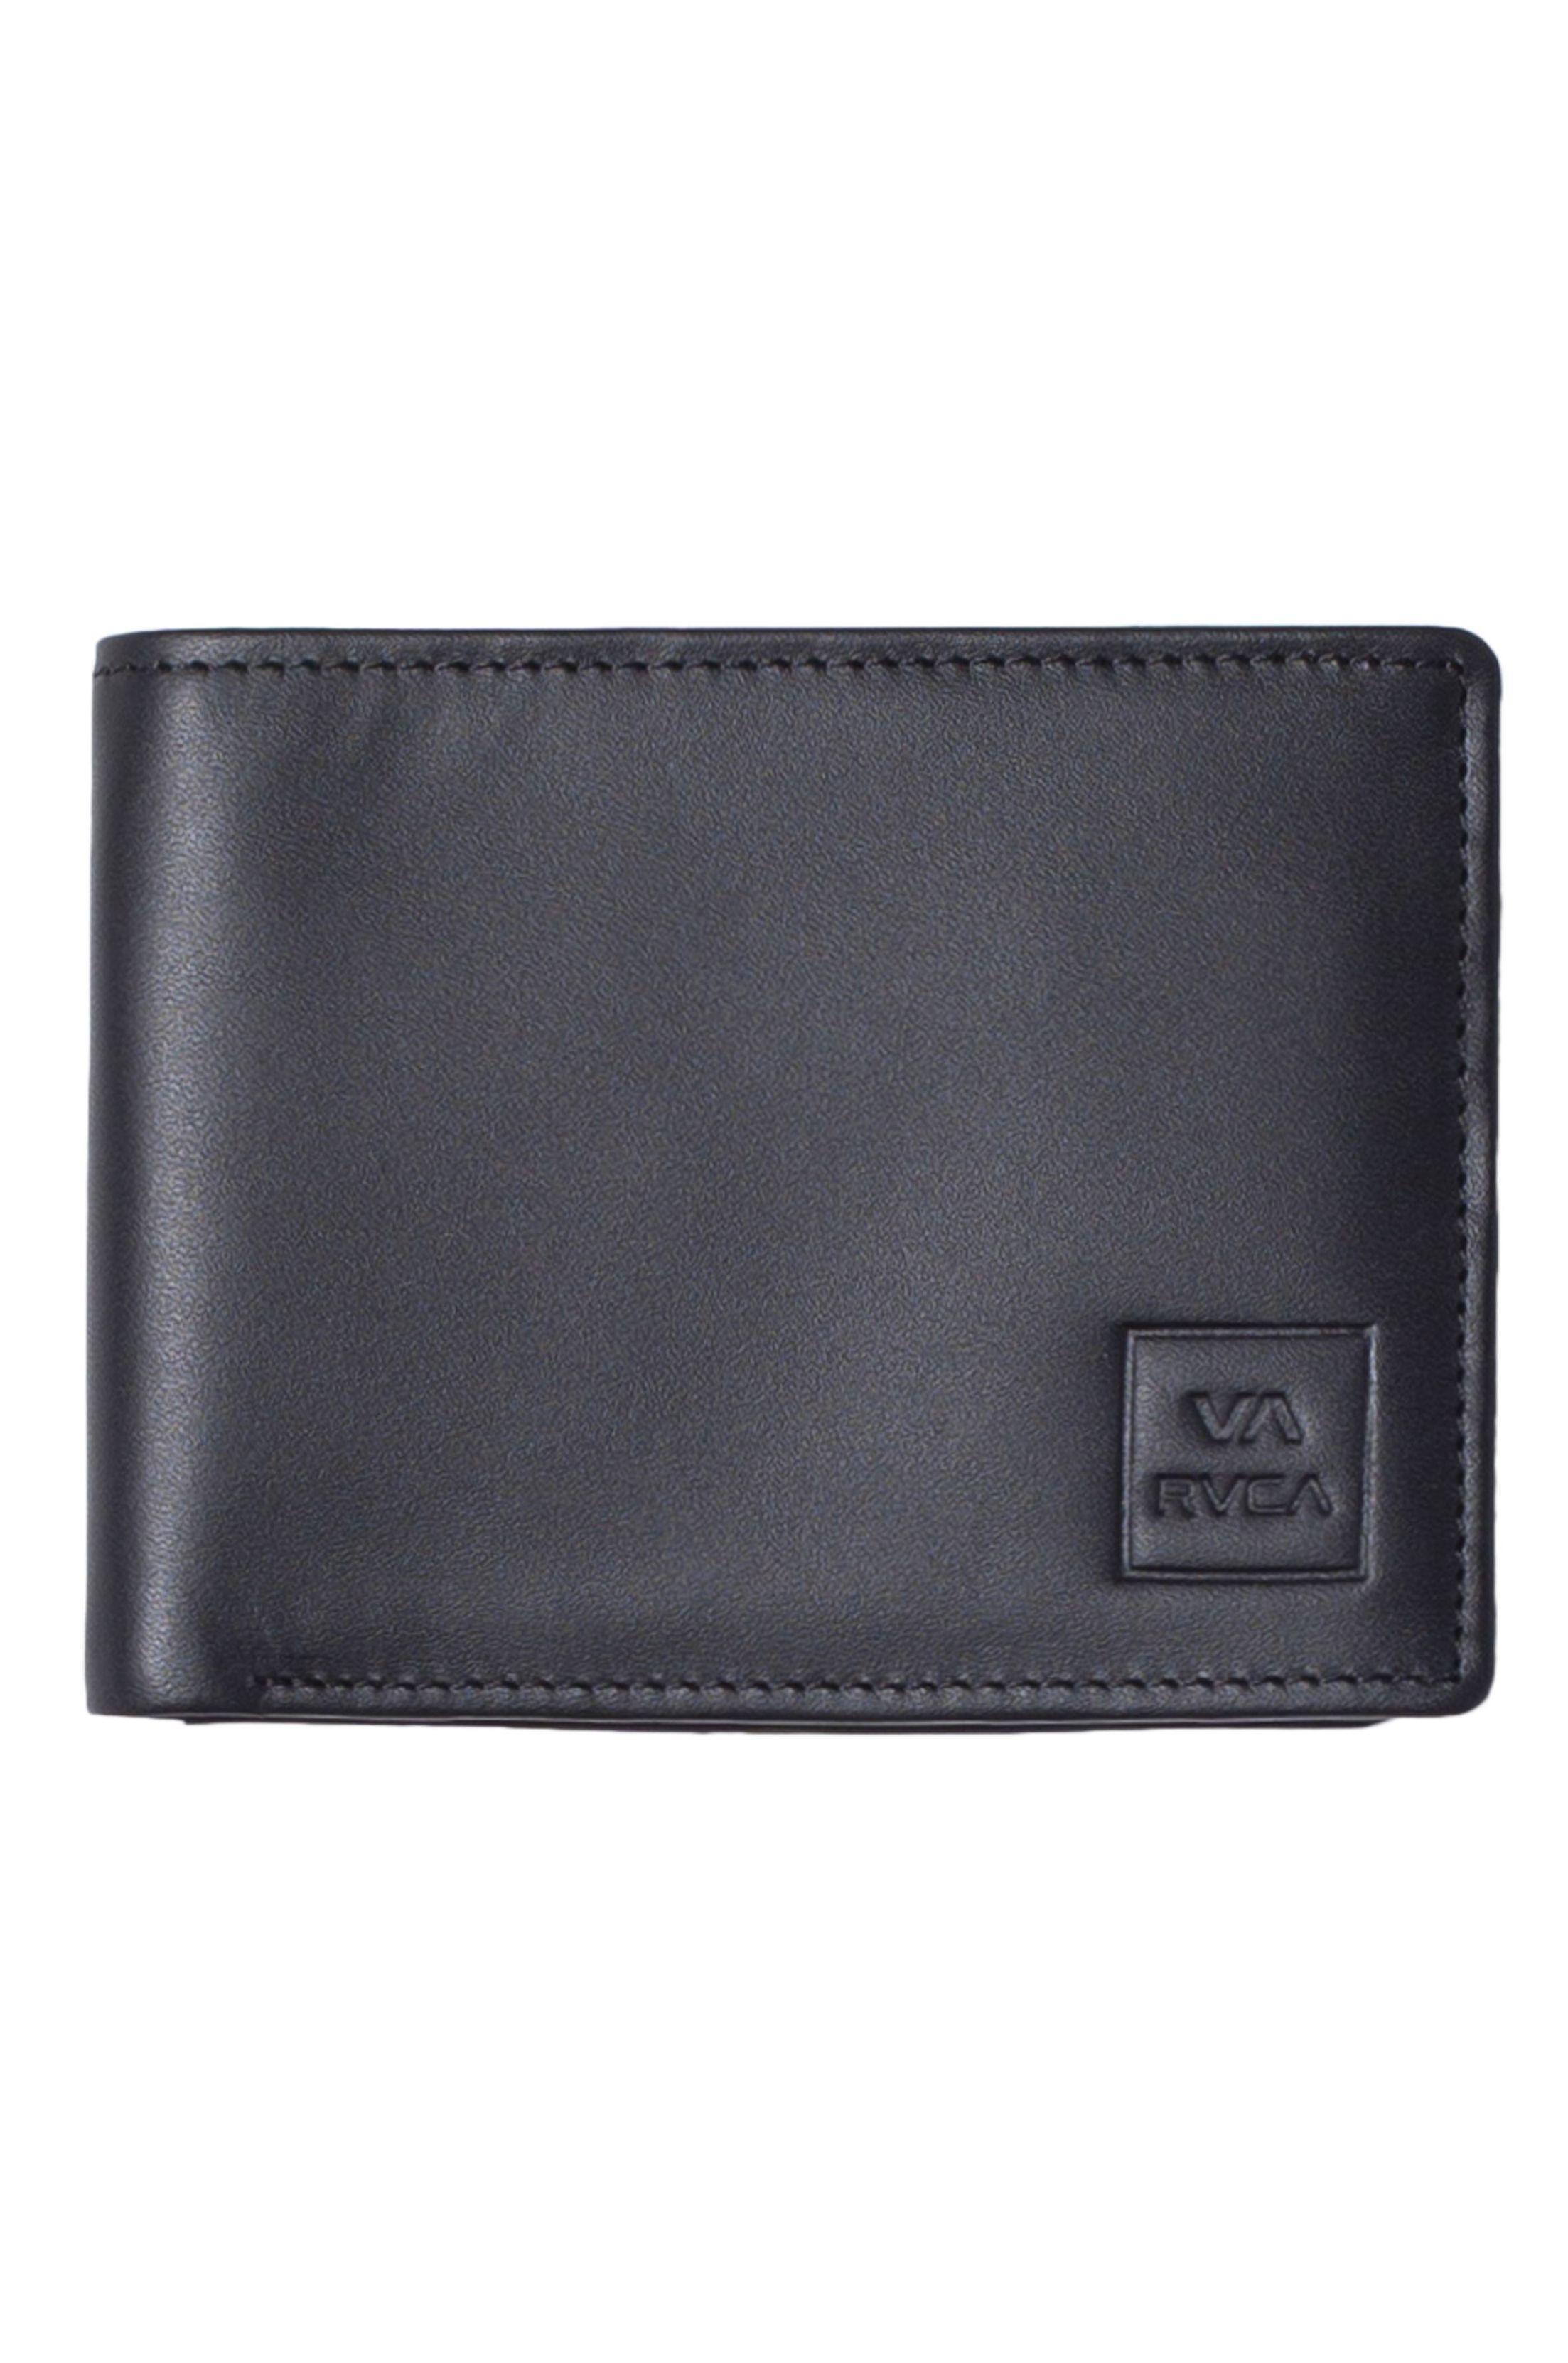 RVCA Wallet CEDAR BIFOLD WALLET Black